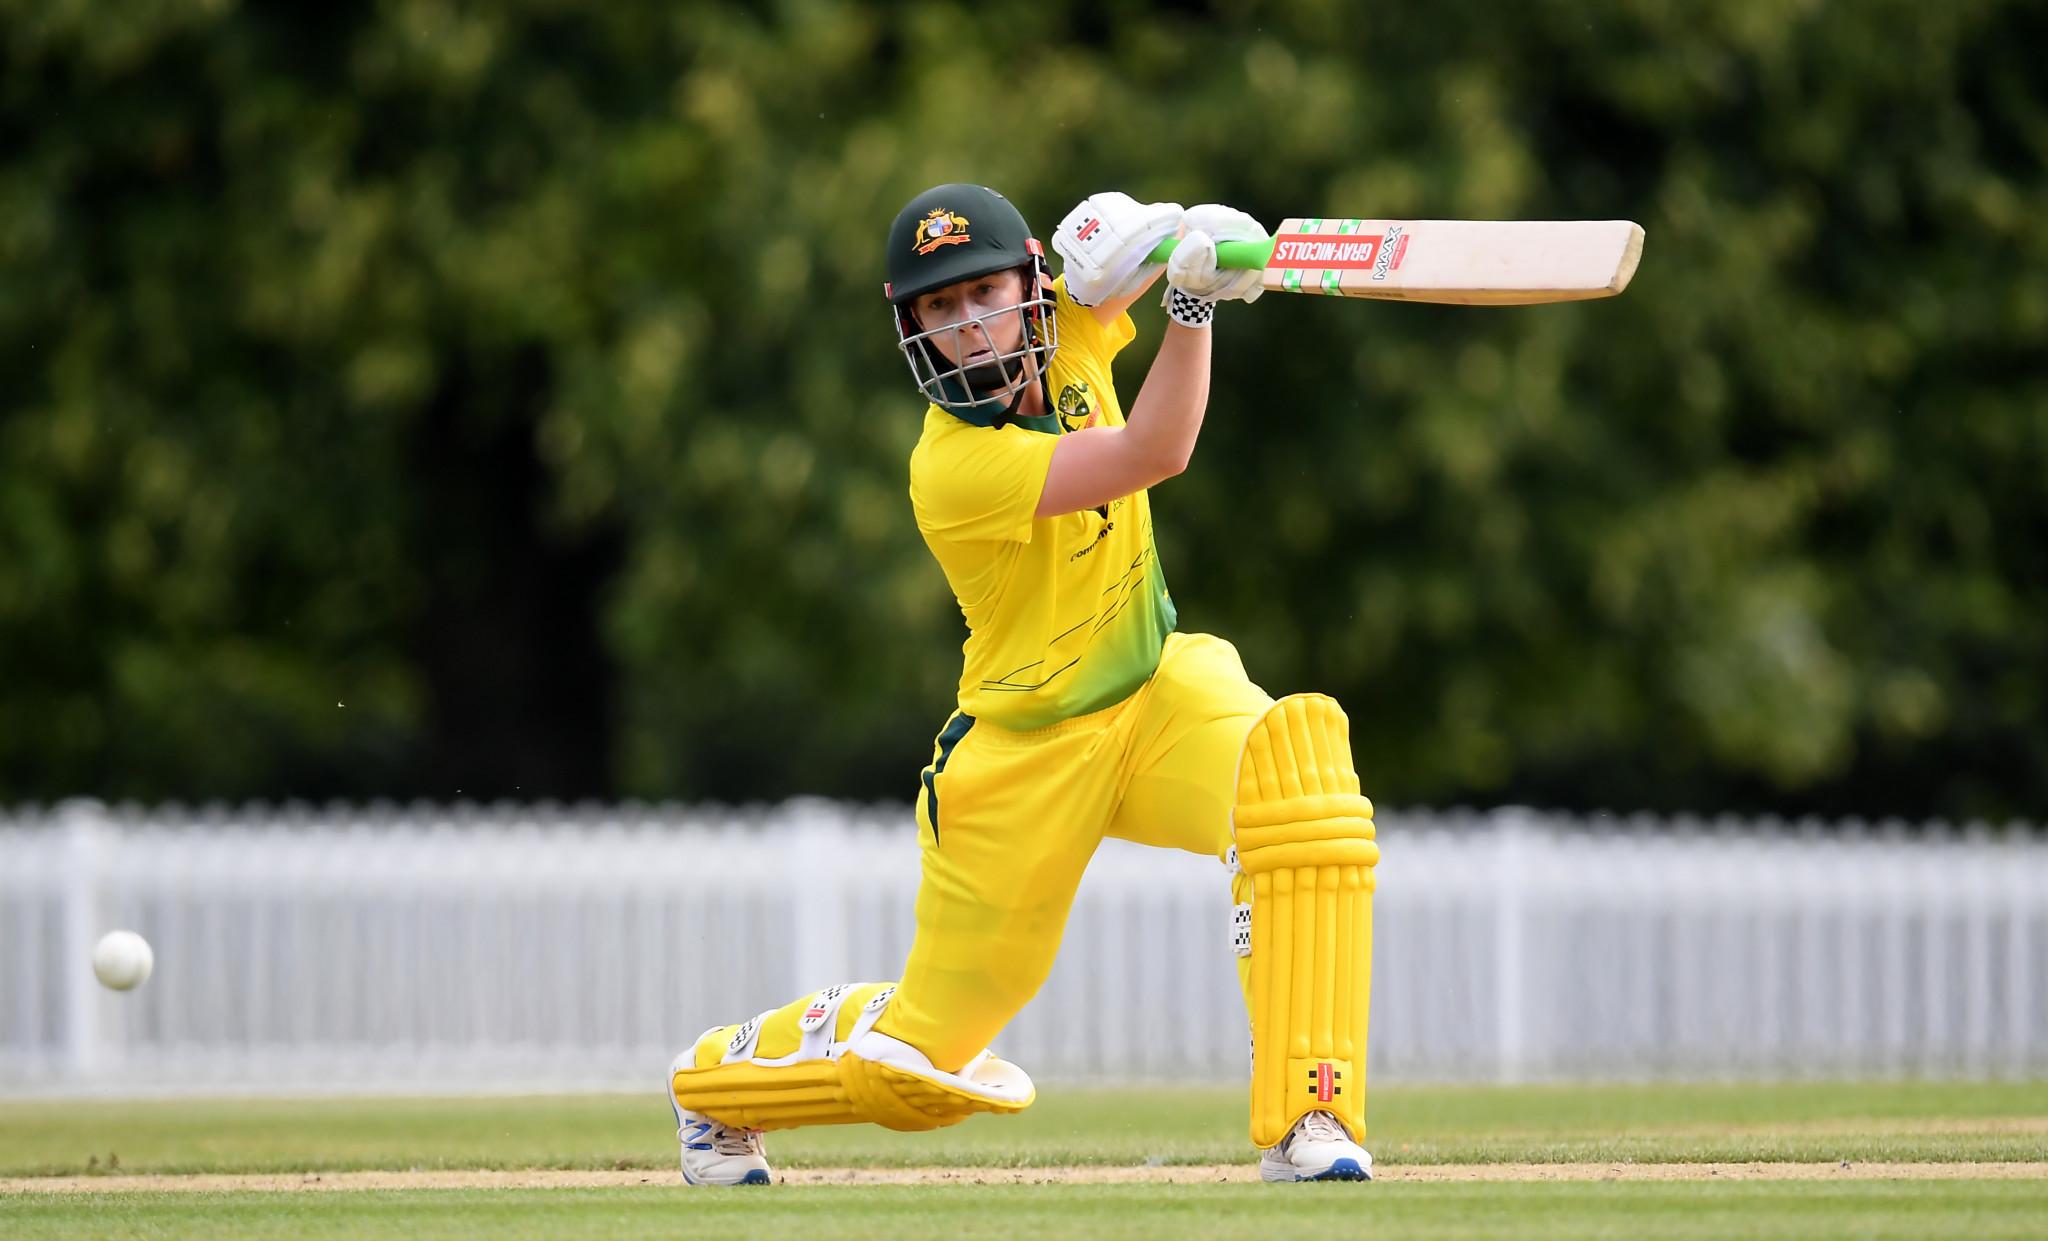 ICC launch T20 World Cups schools programme in Australia